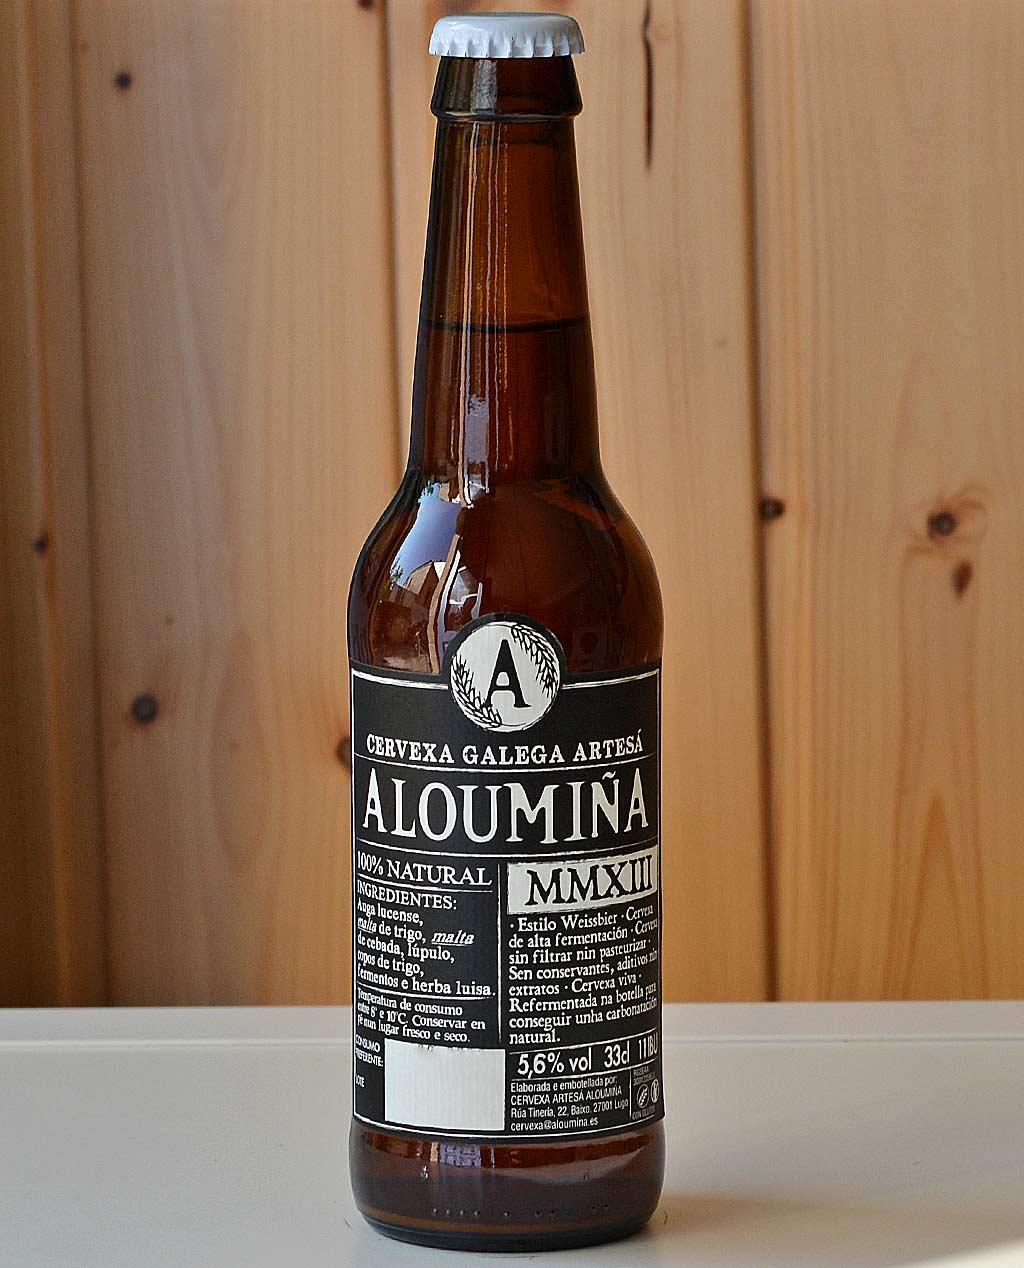 aloumina-cerveza-artesana-craft-beer-lugo-galicia-mmxiii-weissbier-1024